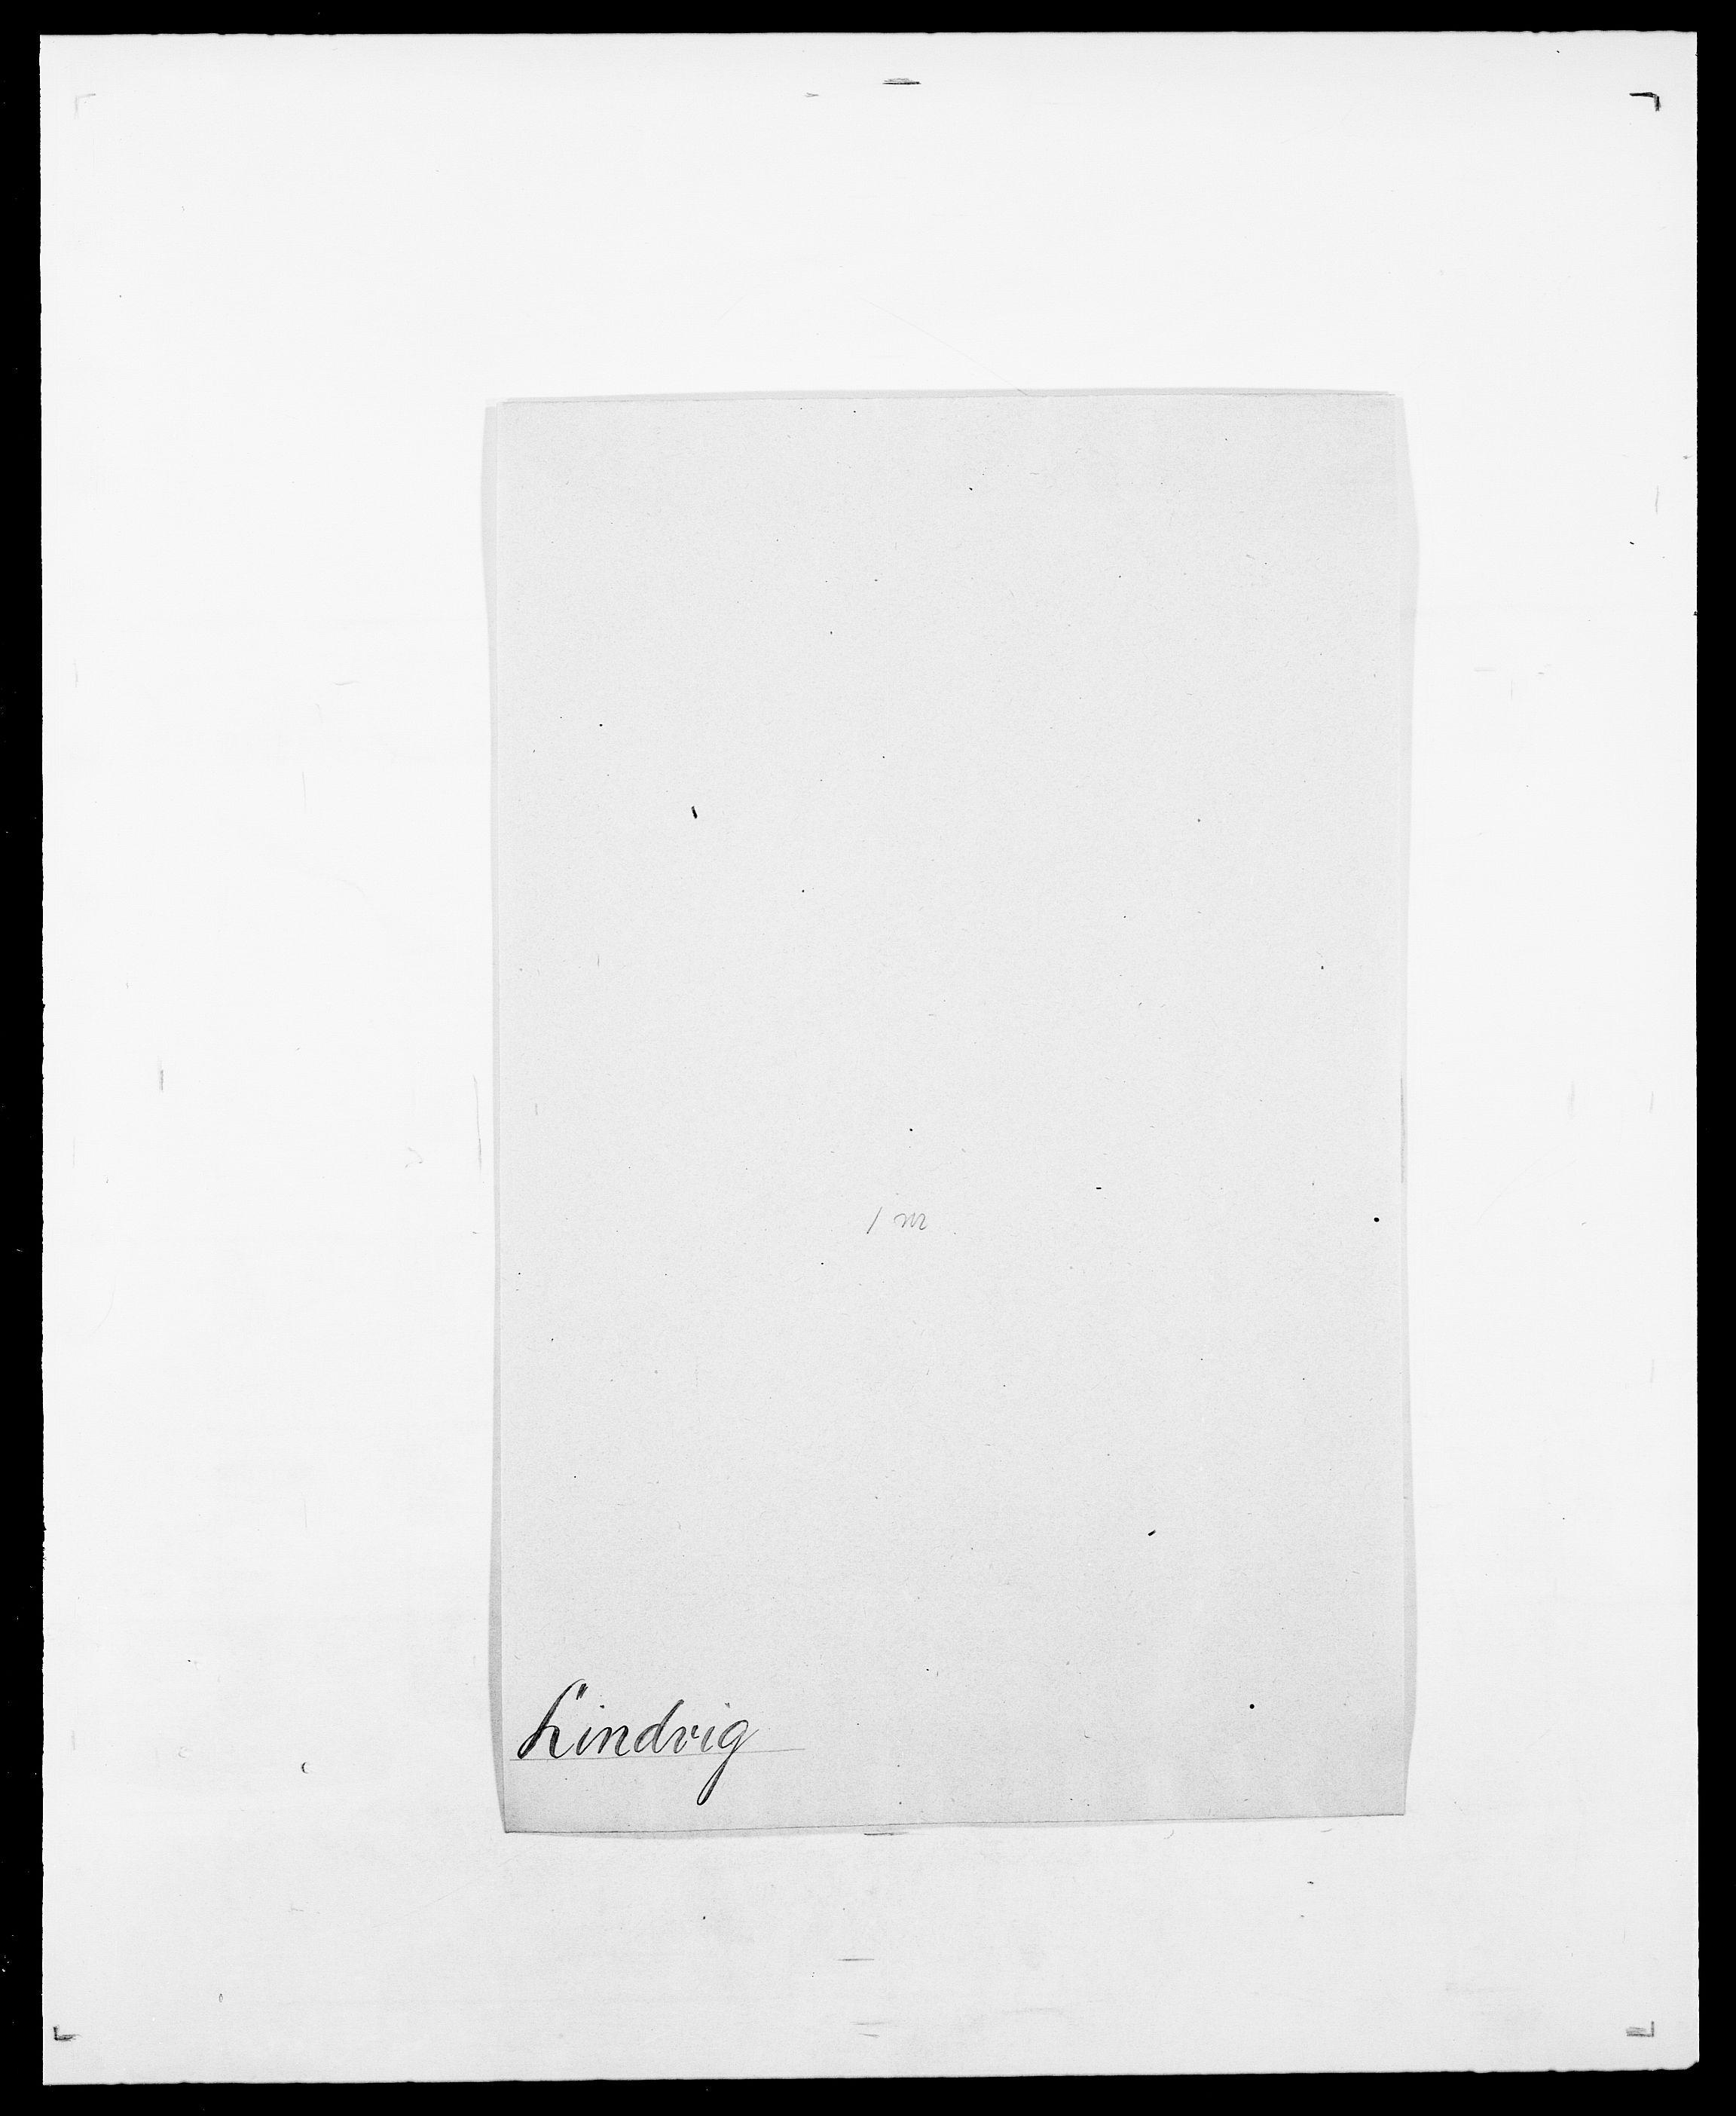 SAO, Delgobe, Charles Antoine - samling, D/Da/L0023: Lau - Lirvyn, s. 638